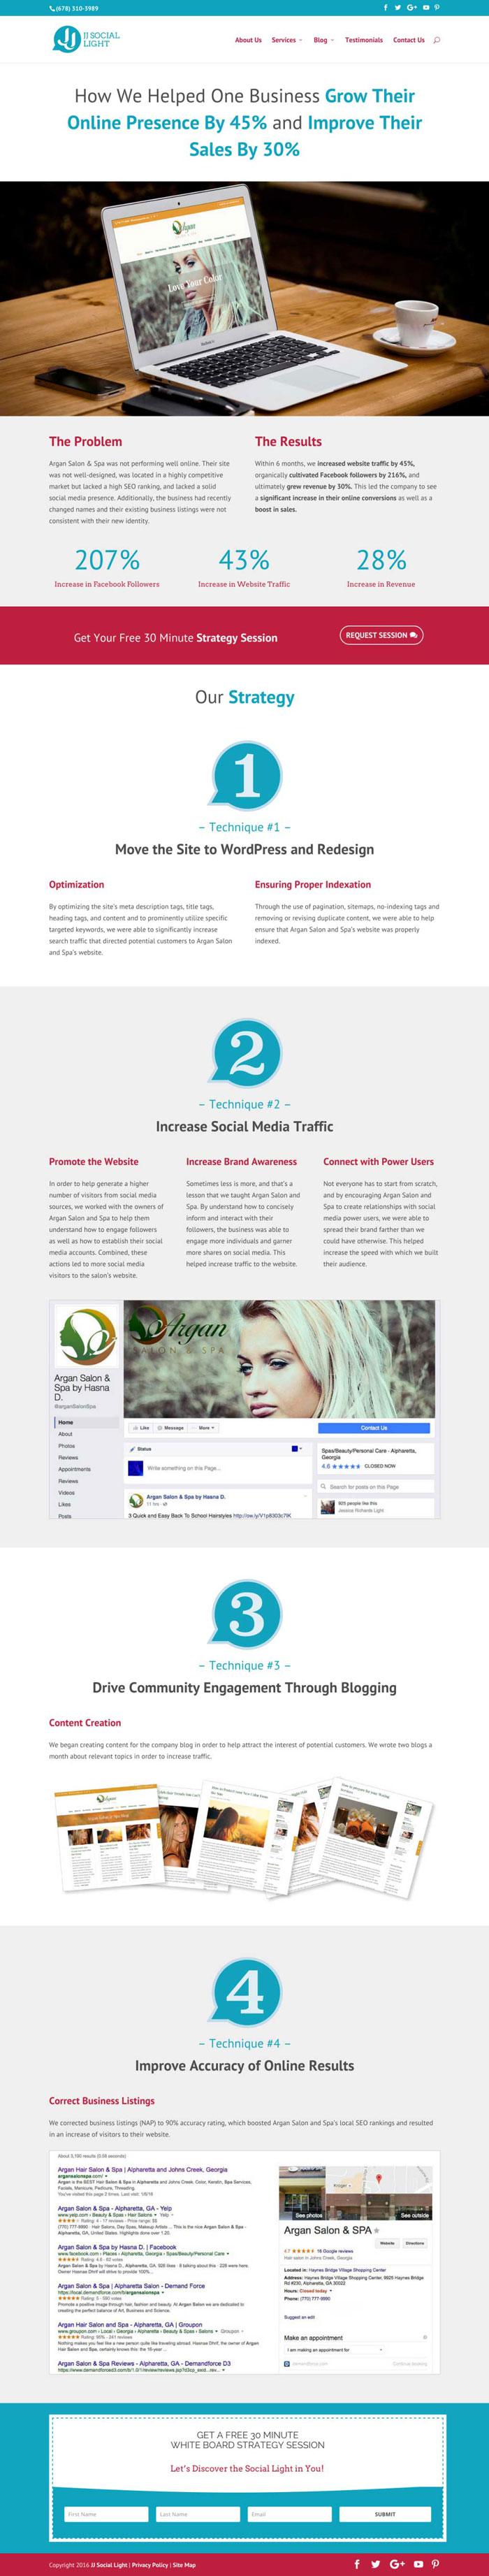 JJ Social Light Landing Page - Online Marketing Client Case Study